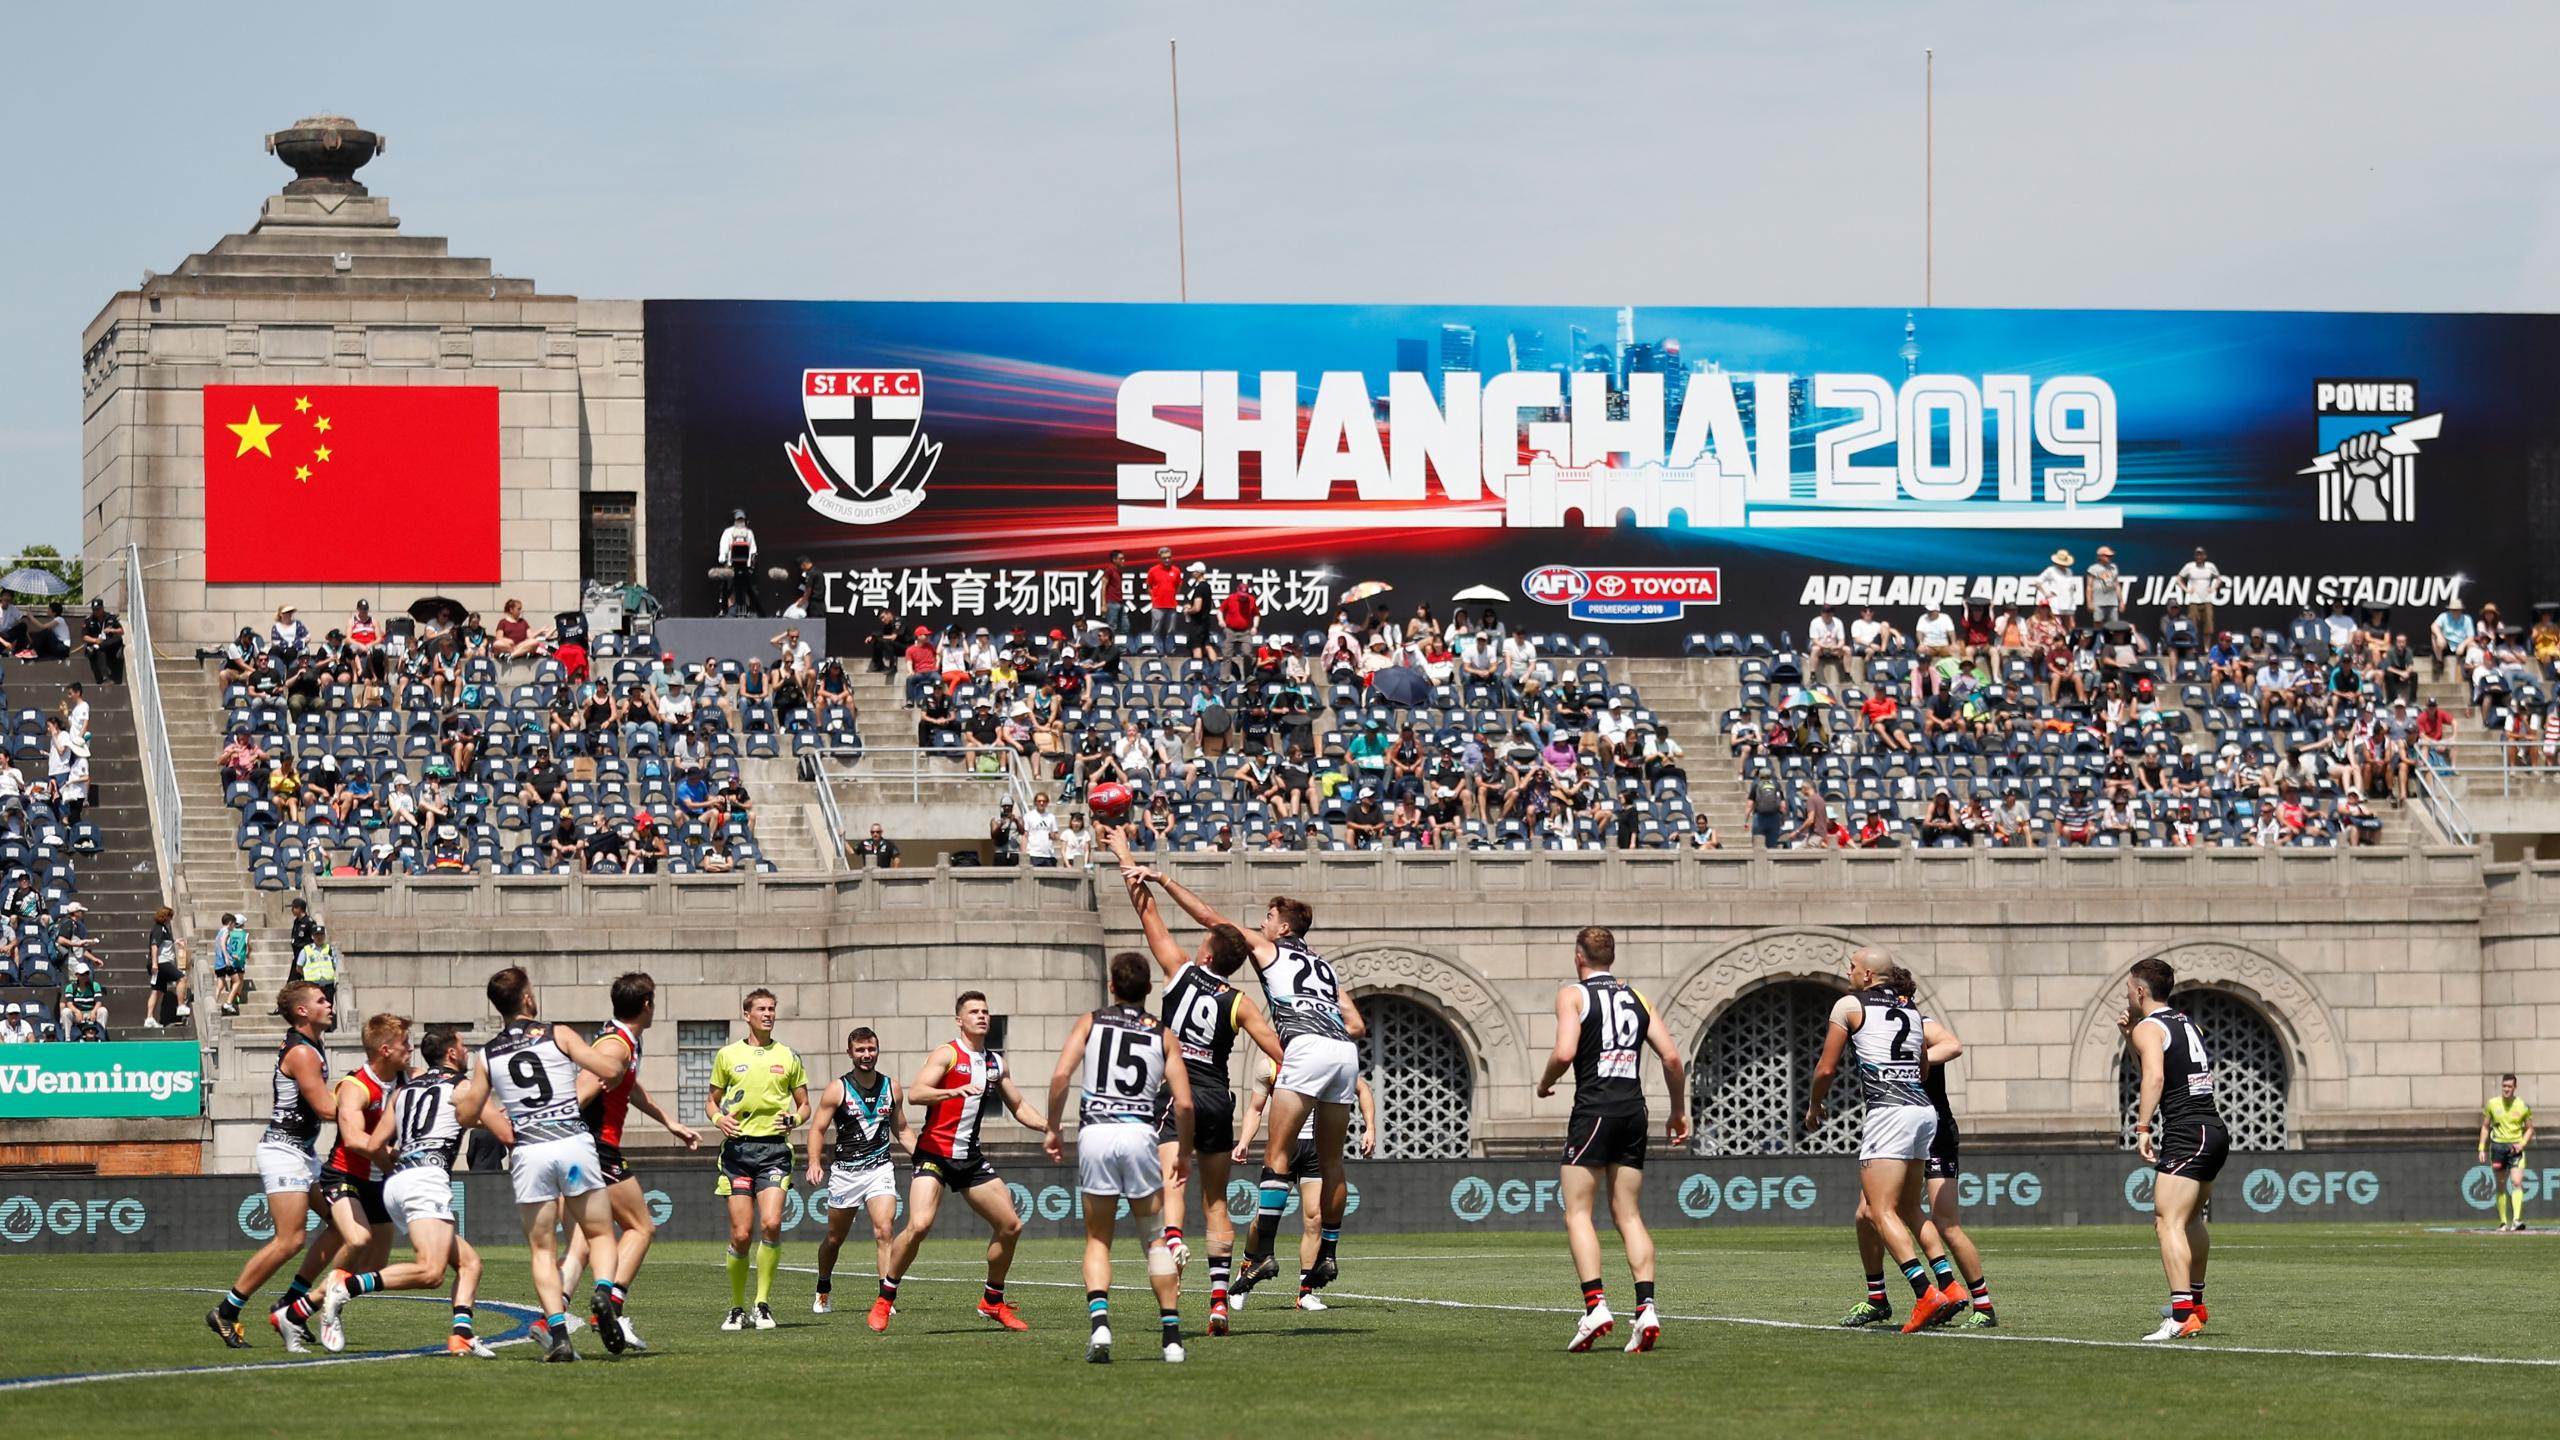 AFL confirms 2020 return to Shanghai between Port Adelaide and St Kilda